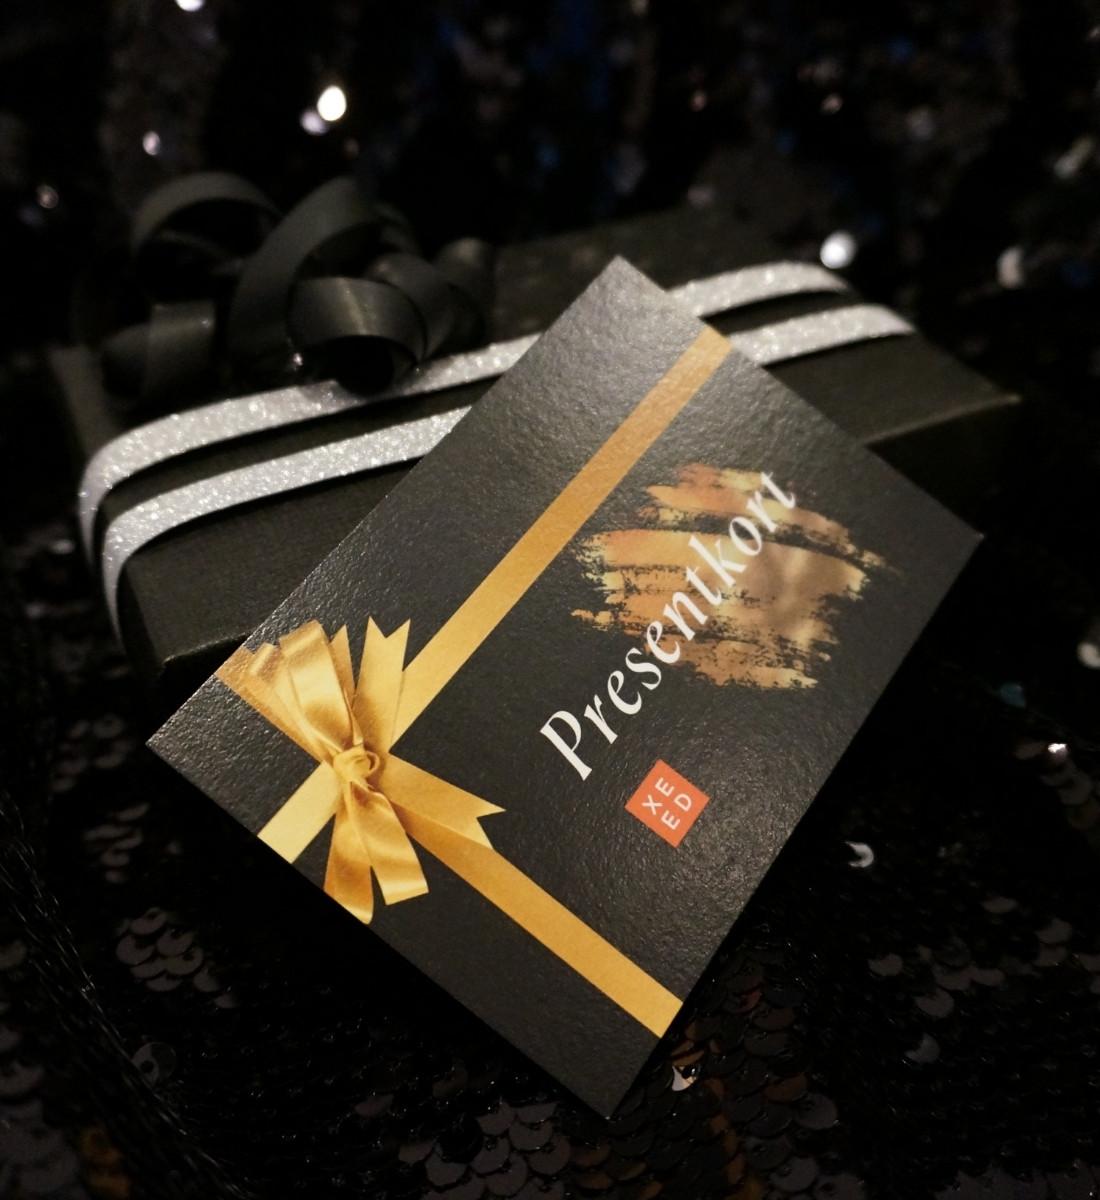 Presentkortsbox Xeed 500kr